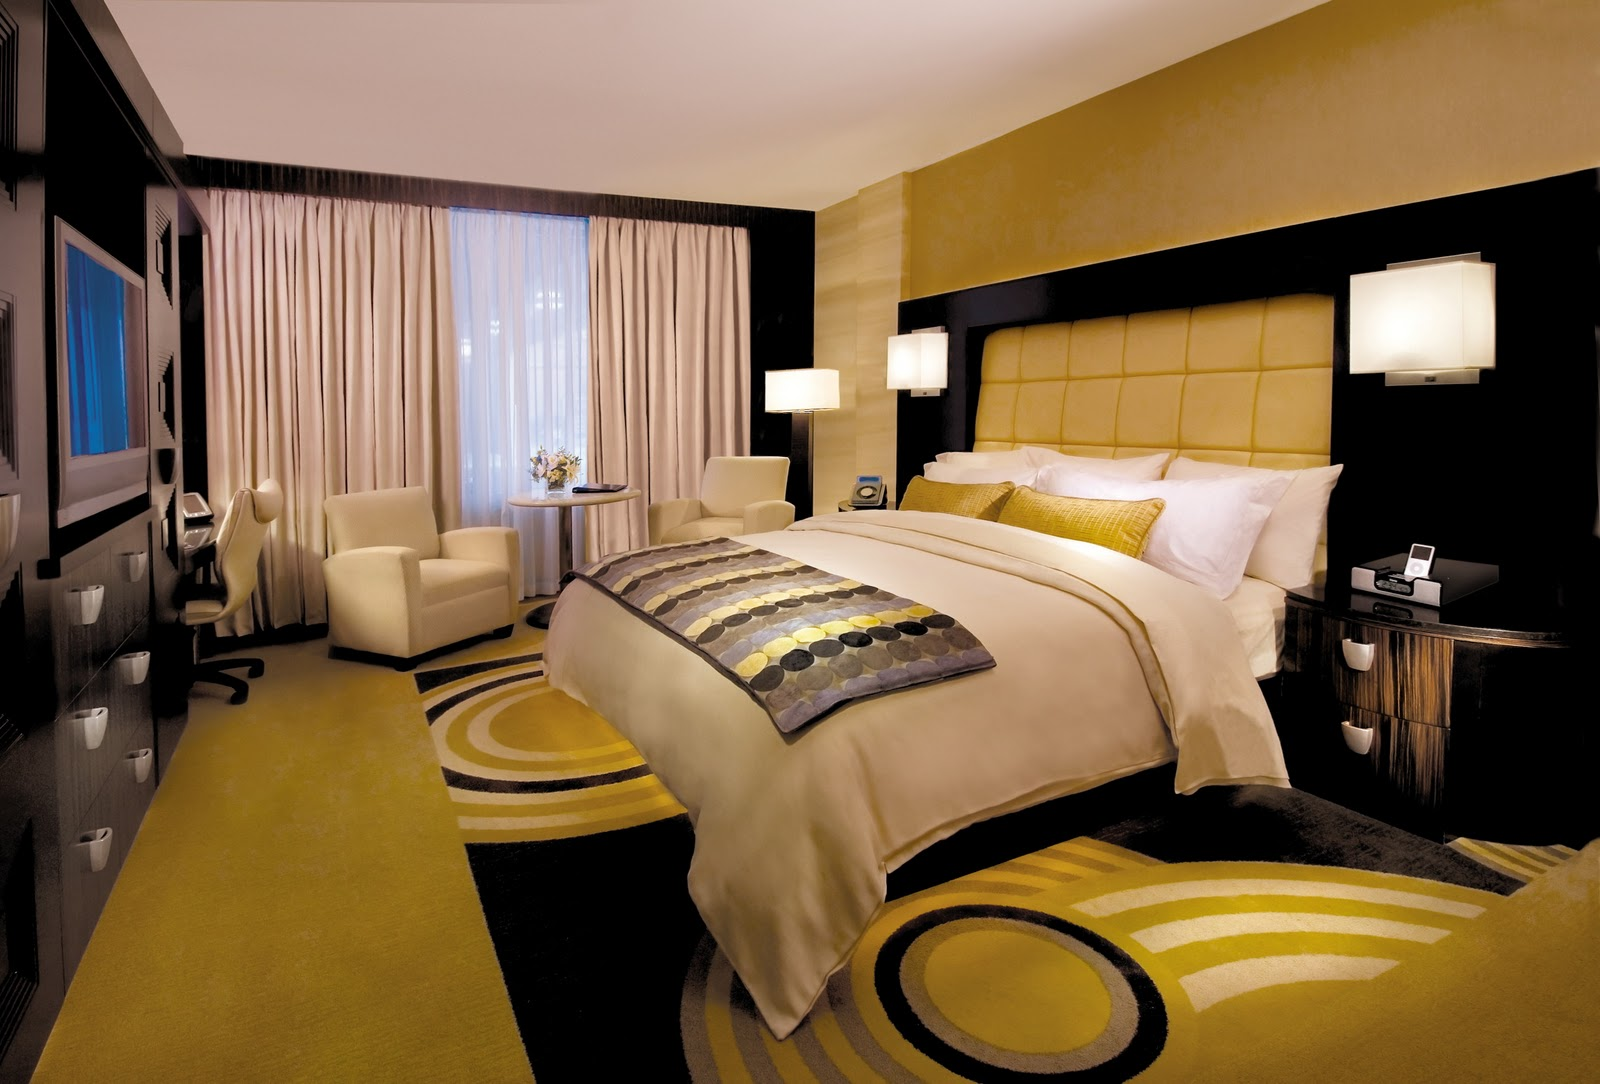 Best Hotel Bedroom Design Ideas On Pinterest Room Design Hotel